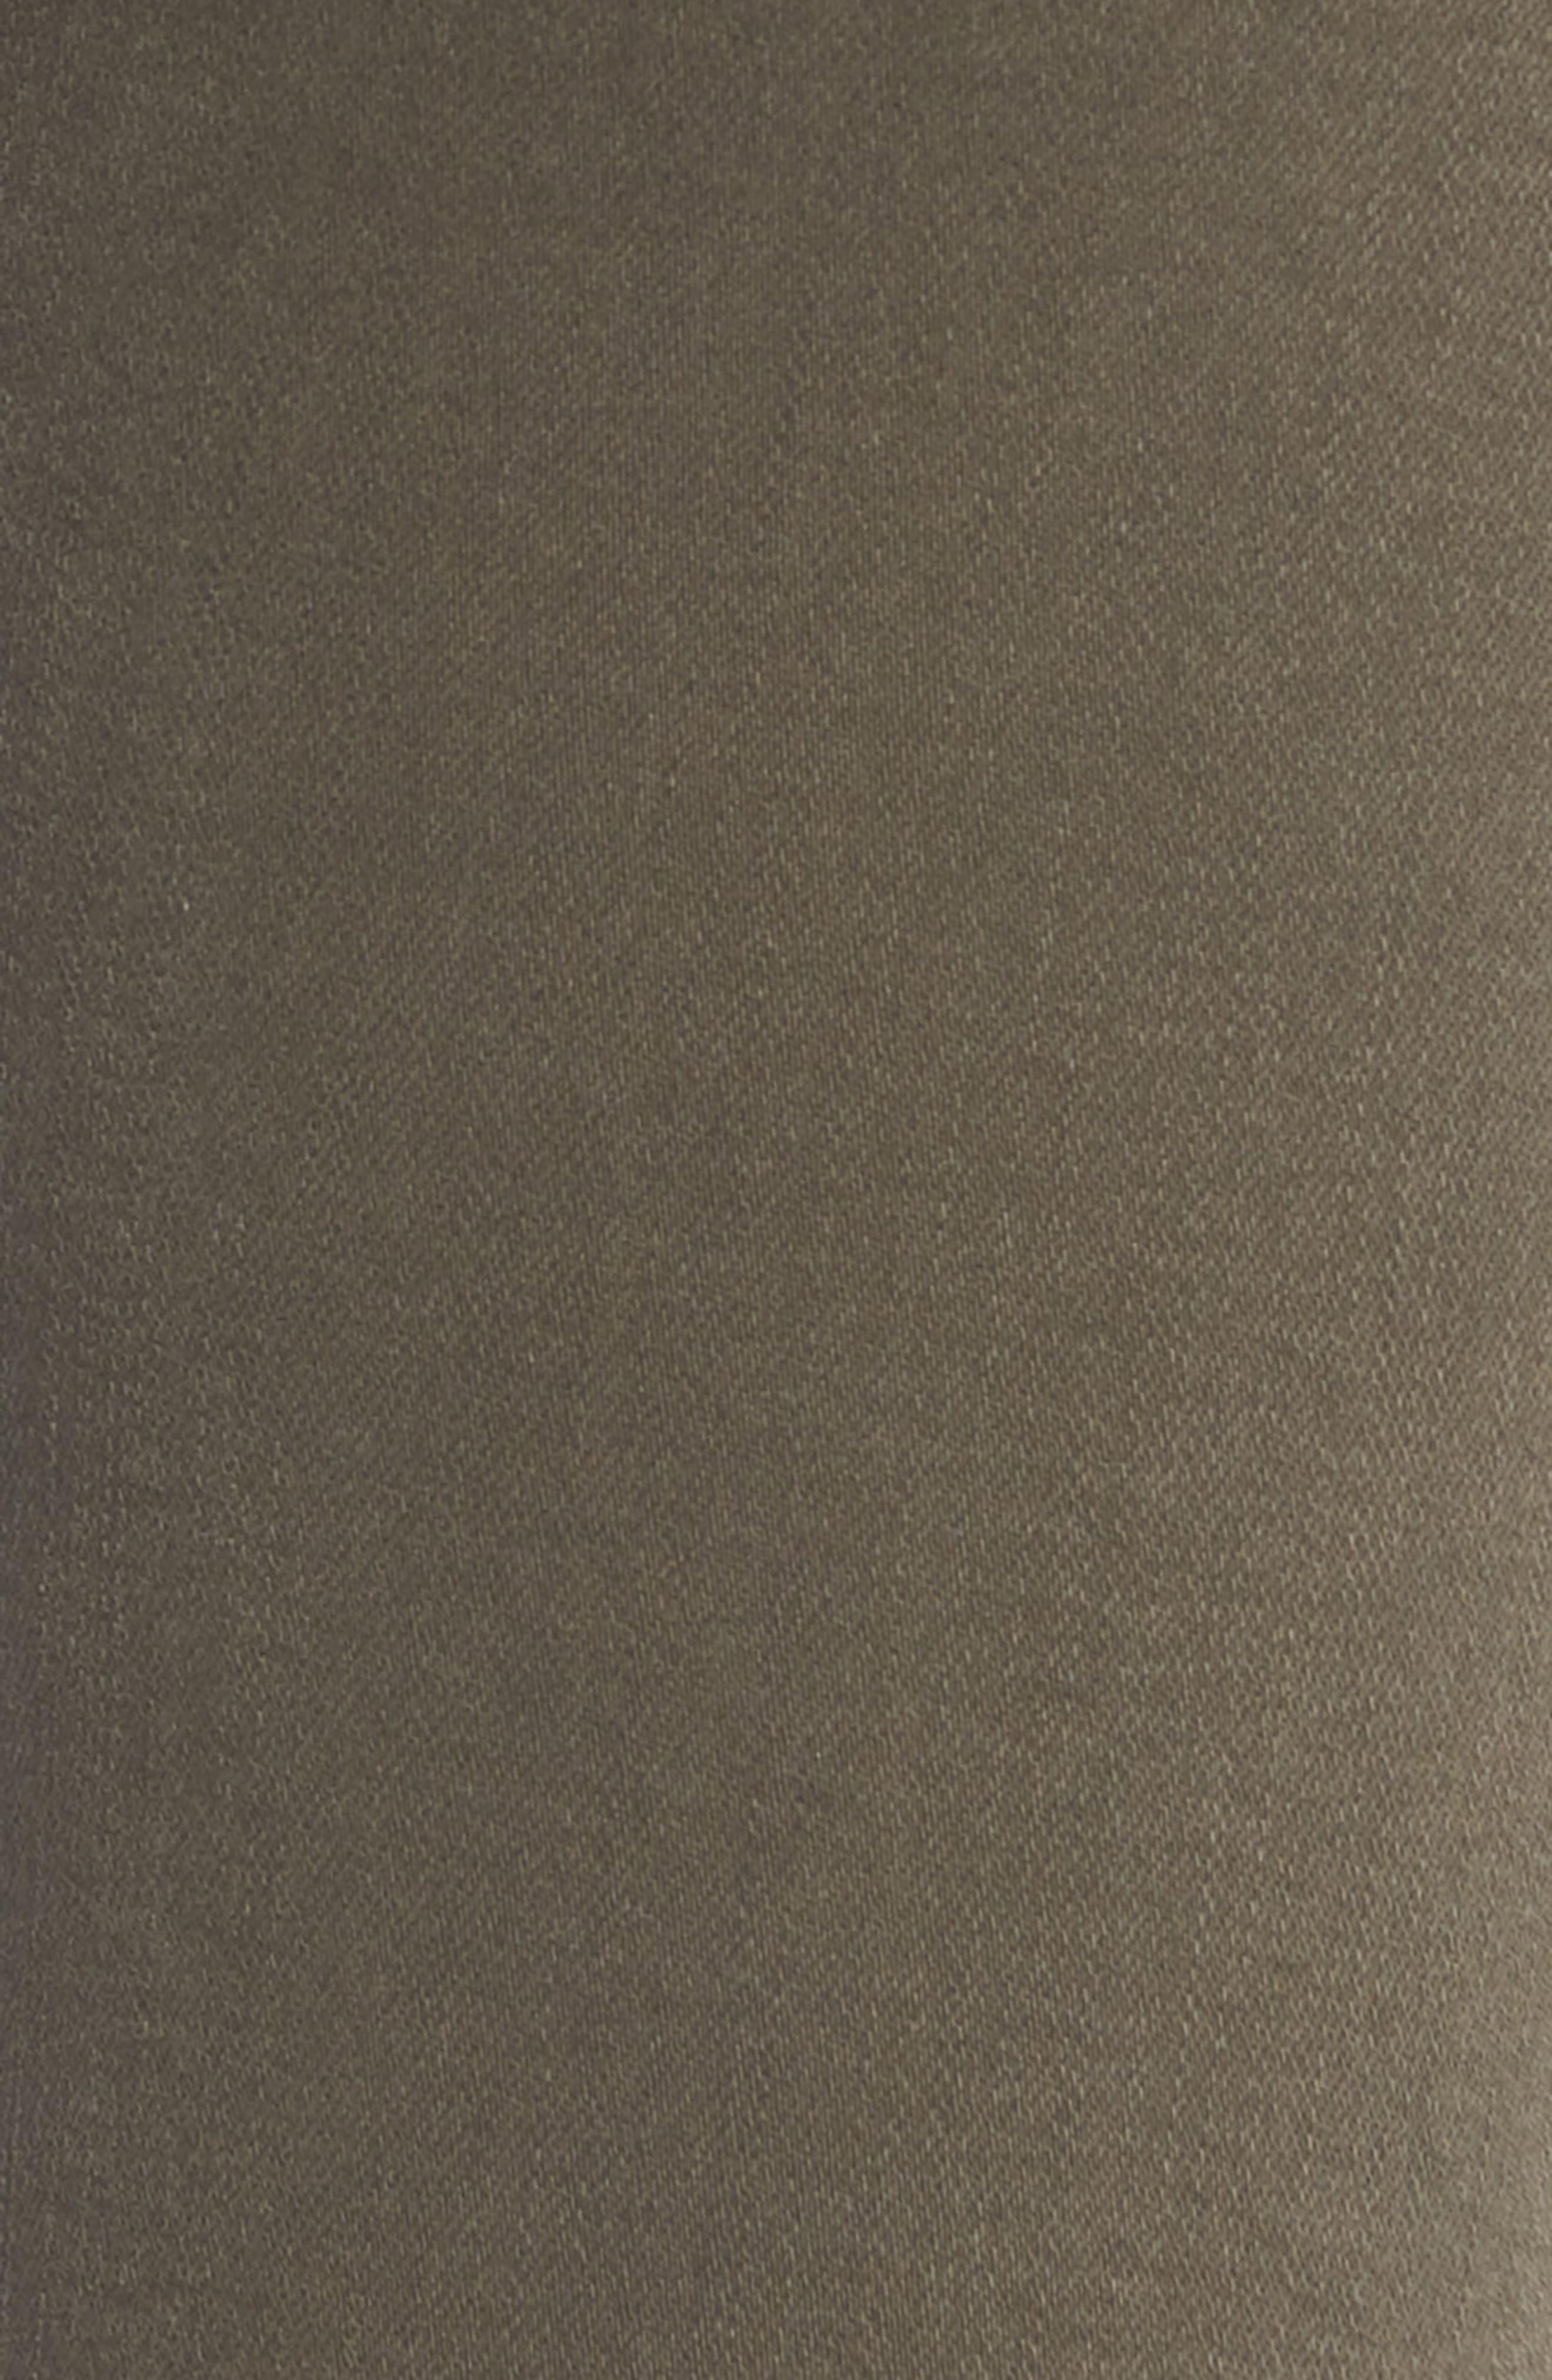 HudsonJeans Nico Super Skinny Jeans,                             Alternate thumbnail 6, color,                             DISTRESSED DARK FORESTER